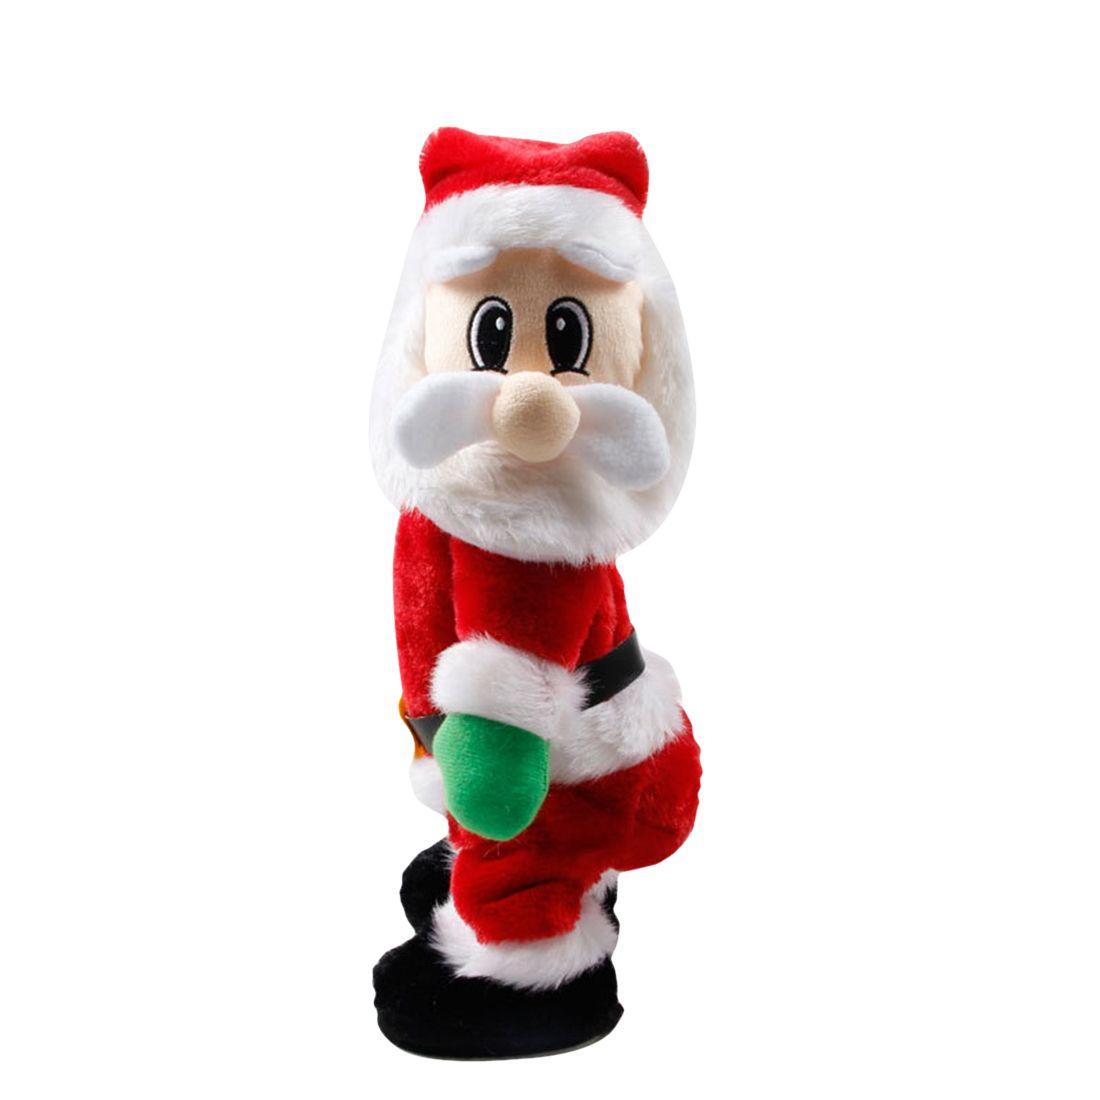 Babbo Natale In Spagnolo.Christmas Electric Music Babbo Natale Toy Doll Per Decorazioni Natalizie Twist Babbo Natale Inglese Spagnolo